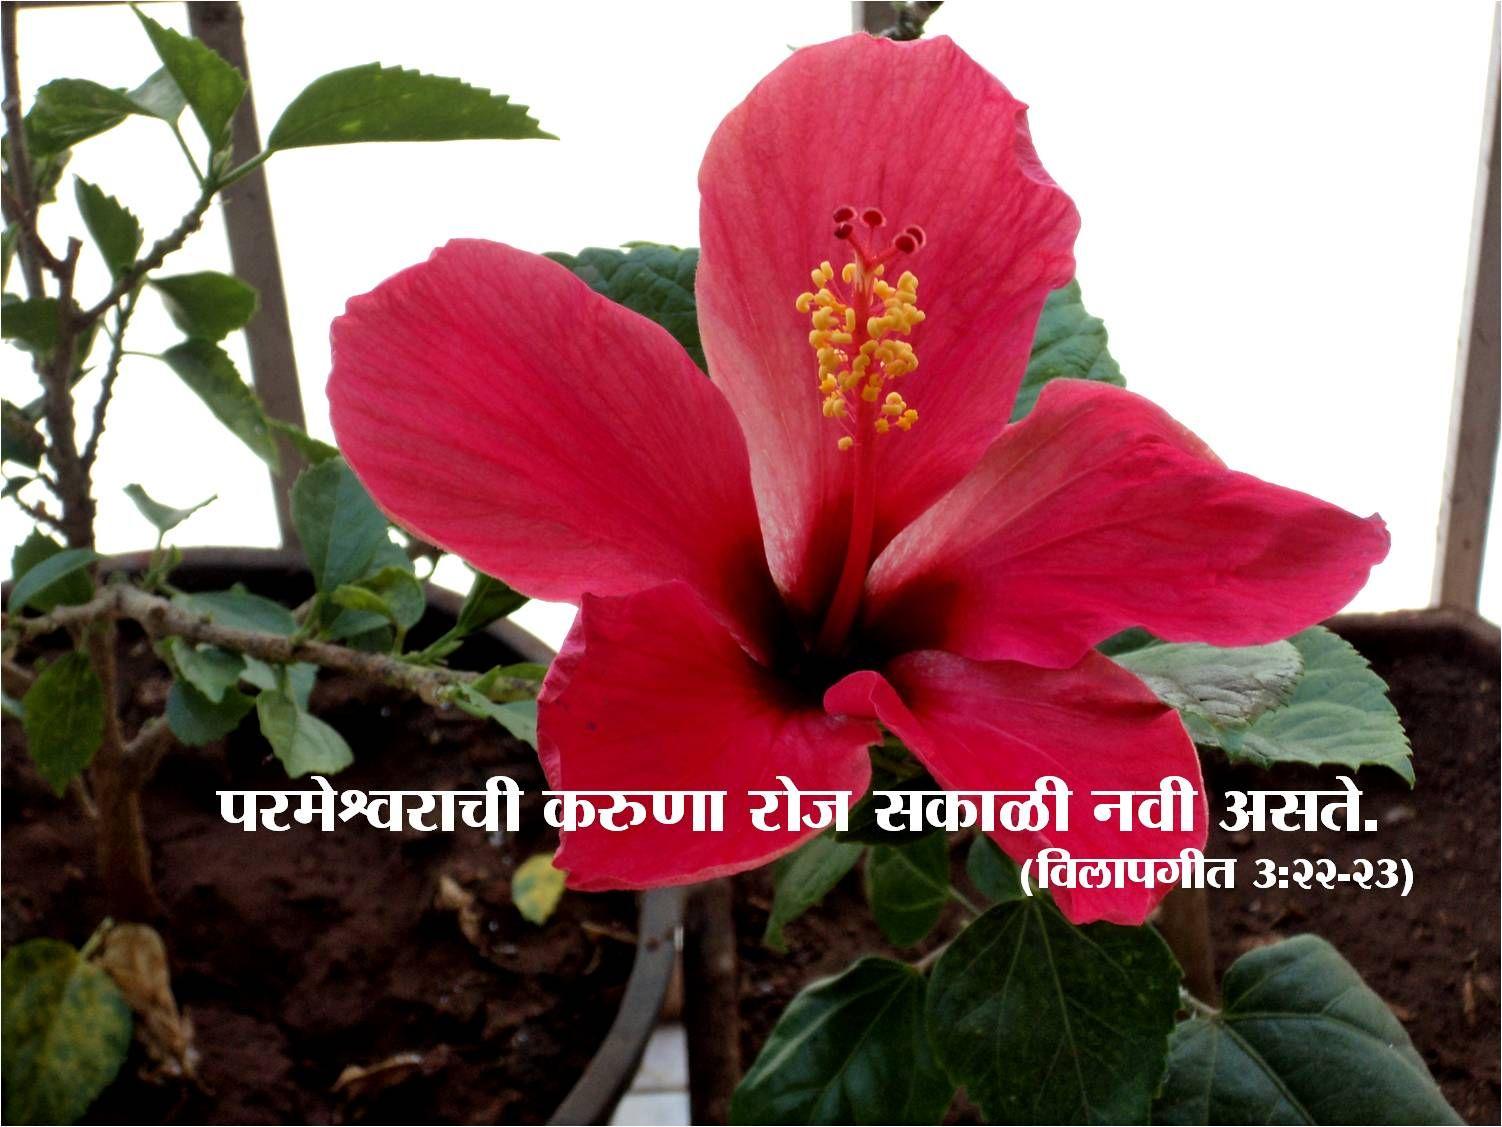 Marathi Good Morning Wallpapers Good Morning Wallpapers